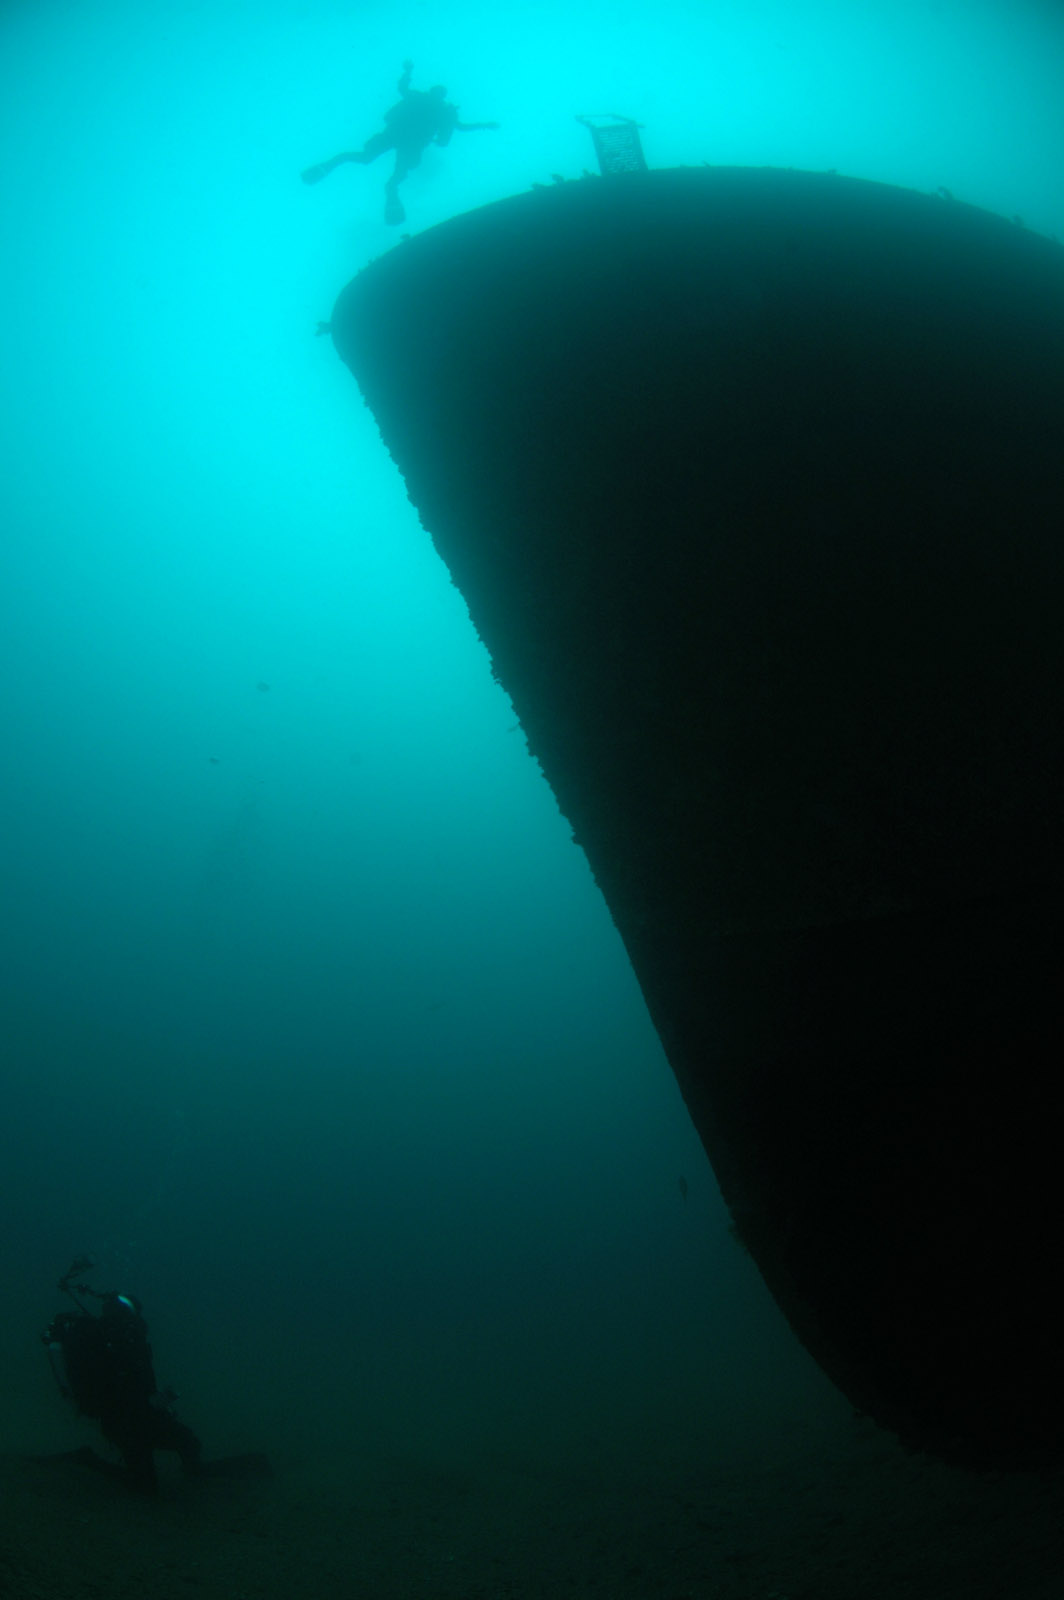 Skip's Underwater Image Gallery > HMNZS Canterbury 2009